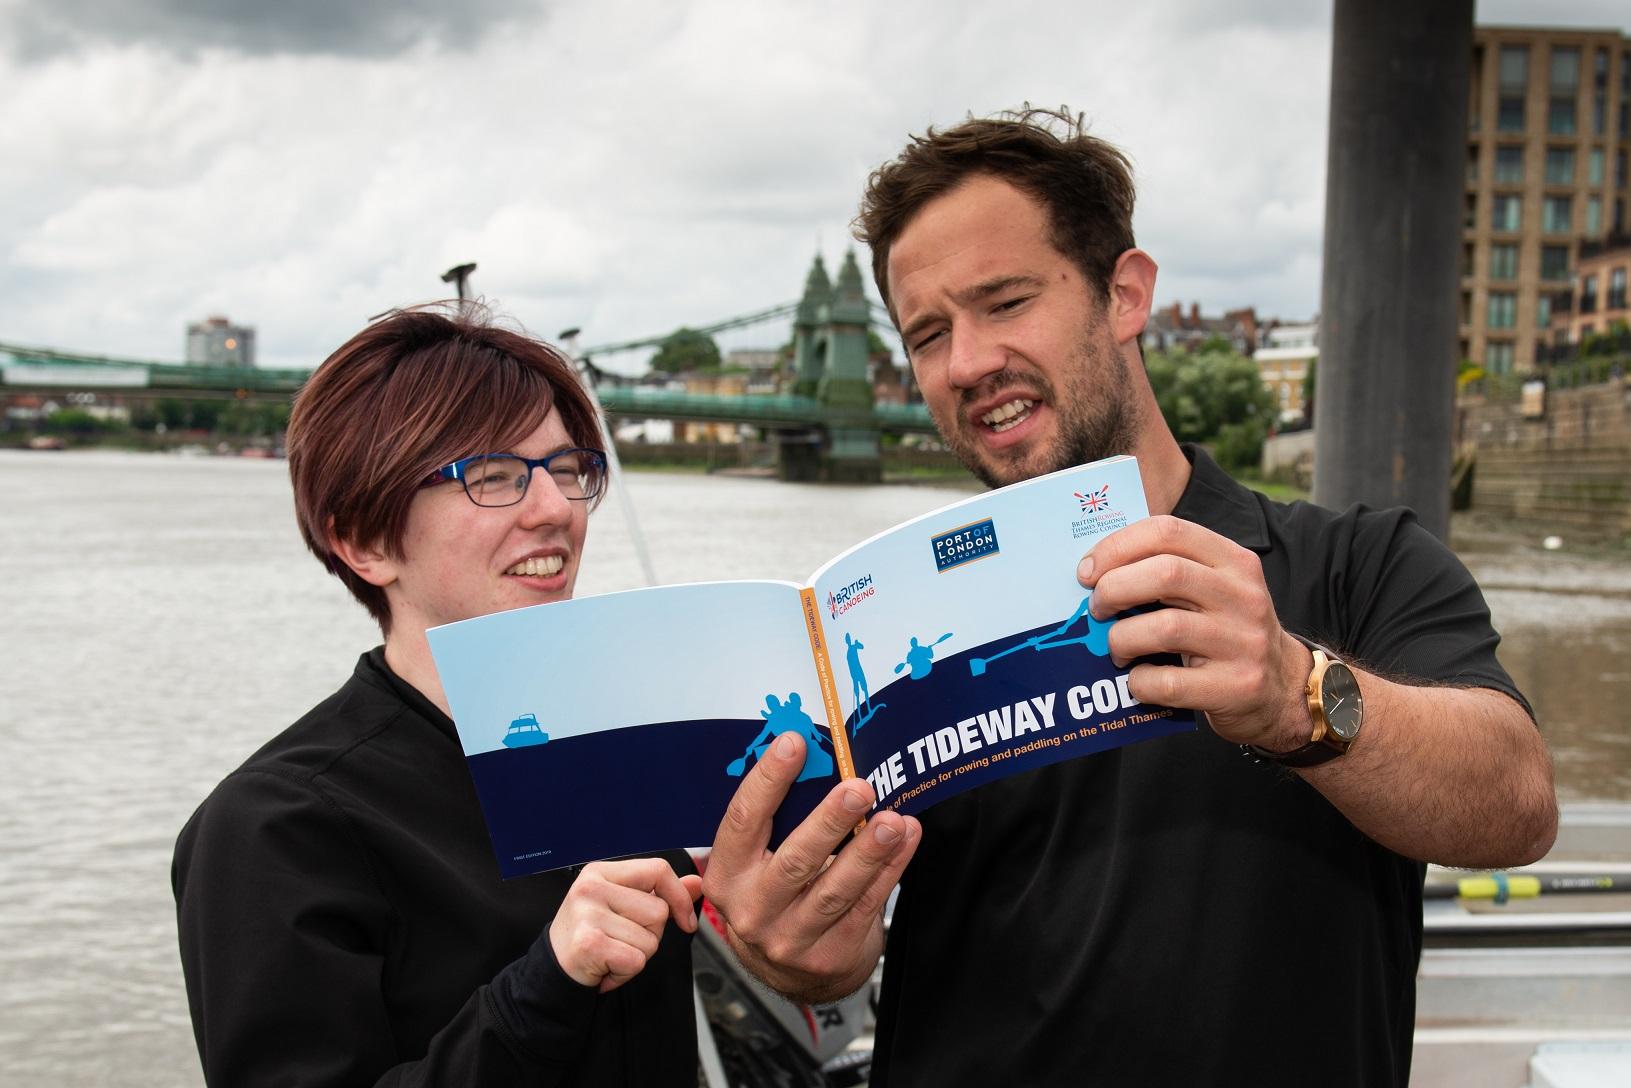 Tidal Thames rowing and paddling safety guide sets sail